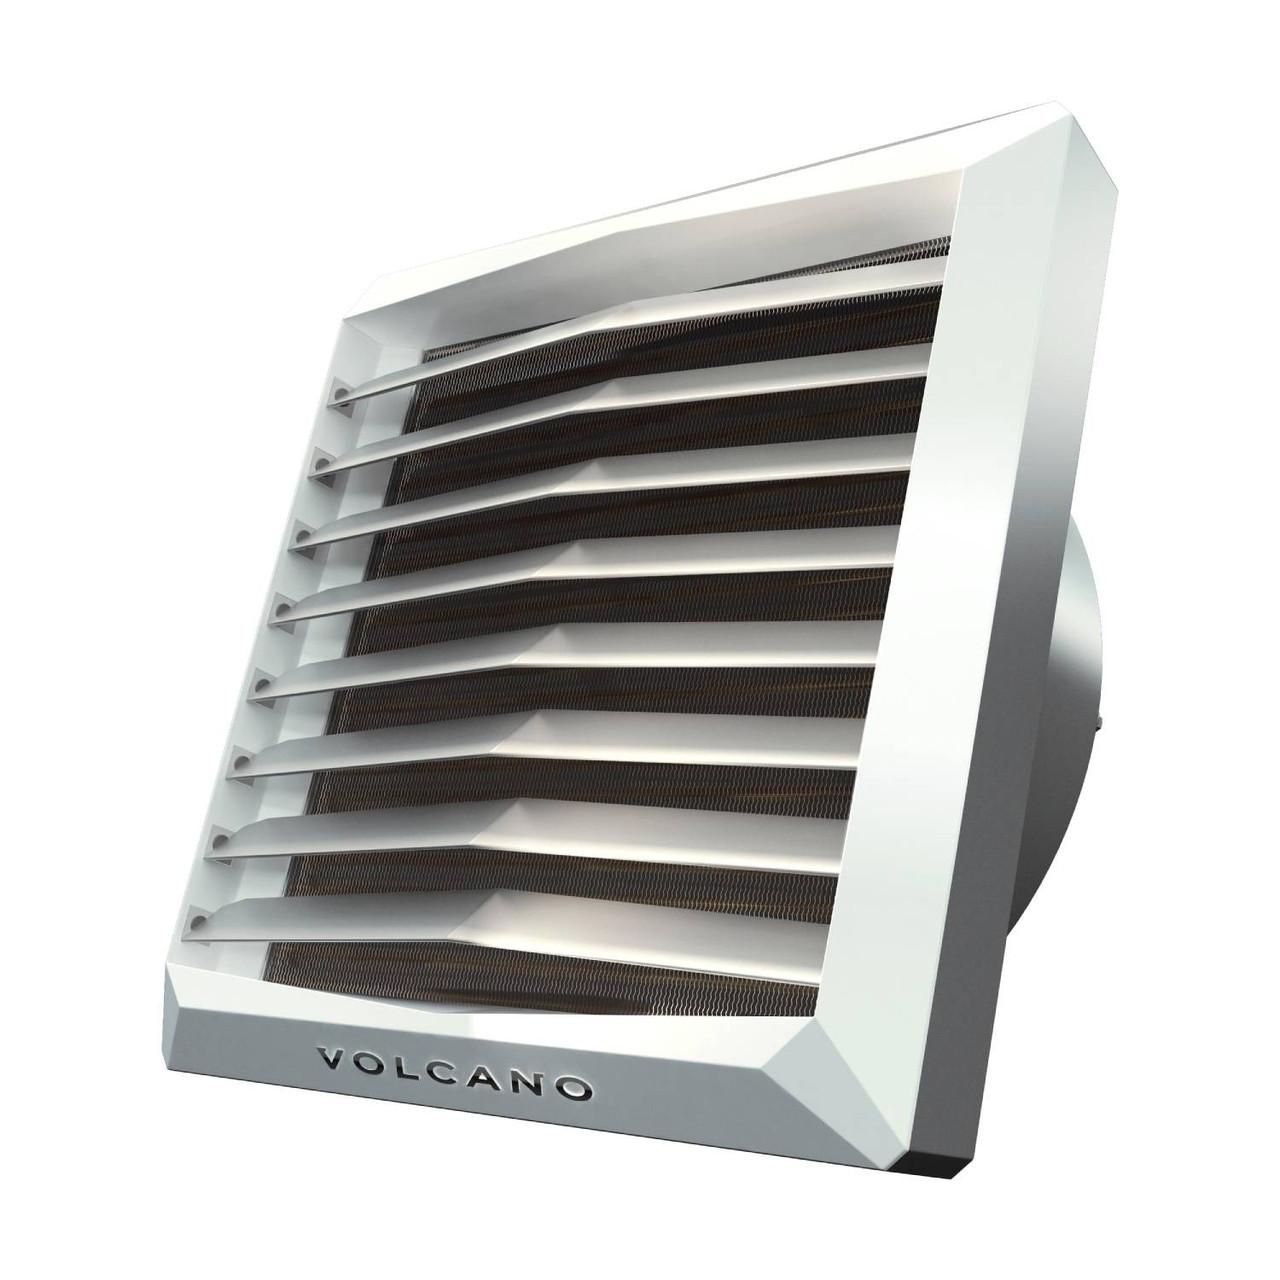 Тепловий вентилятор Volcano VR1 AC